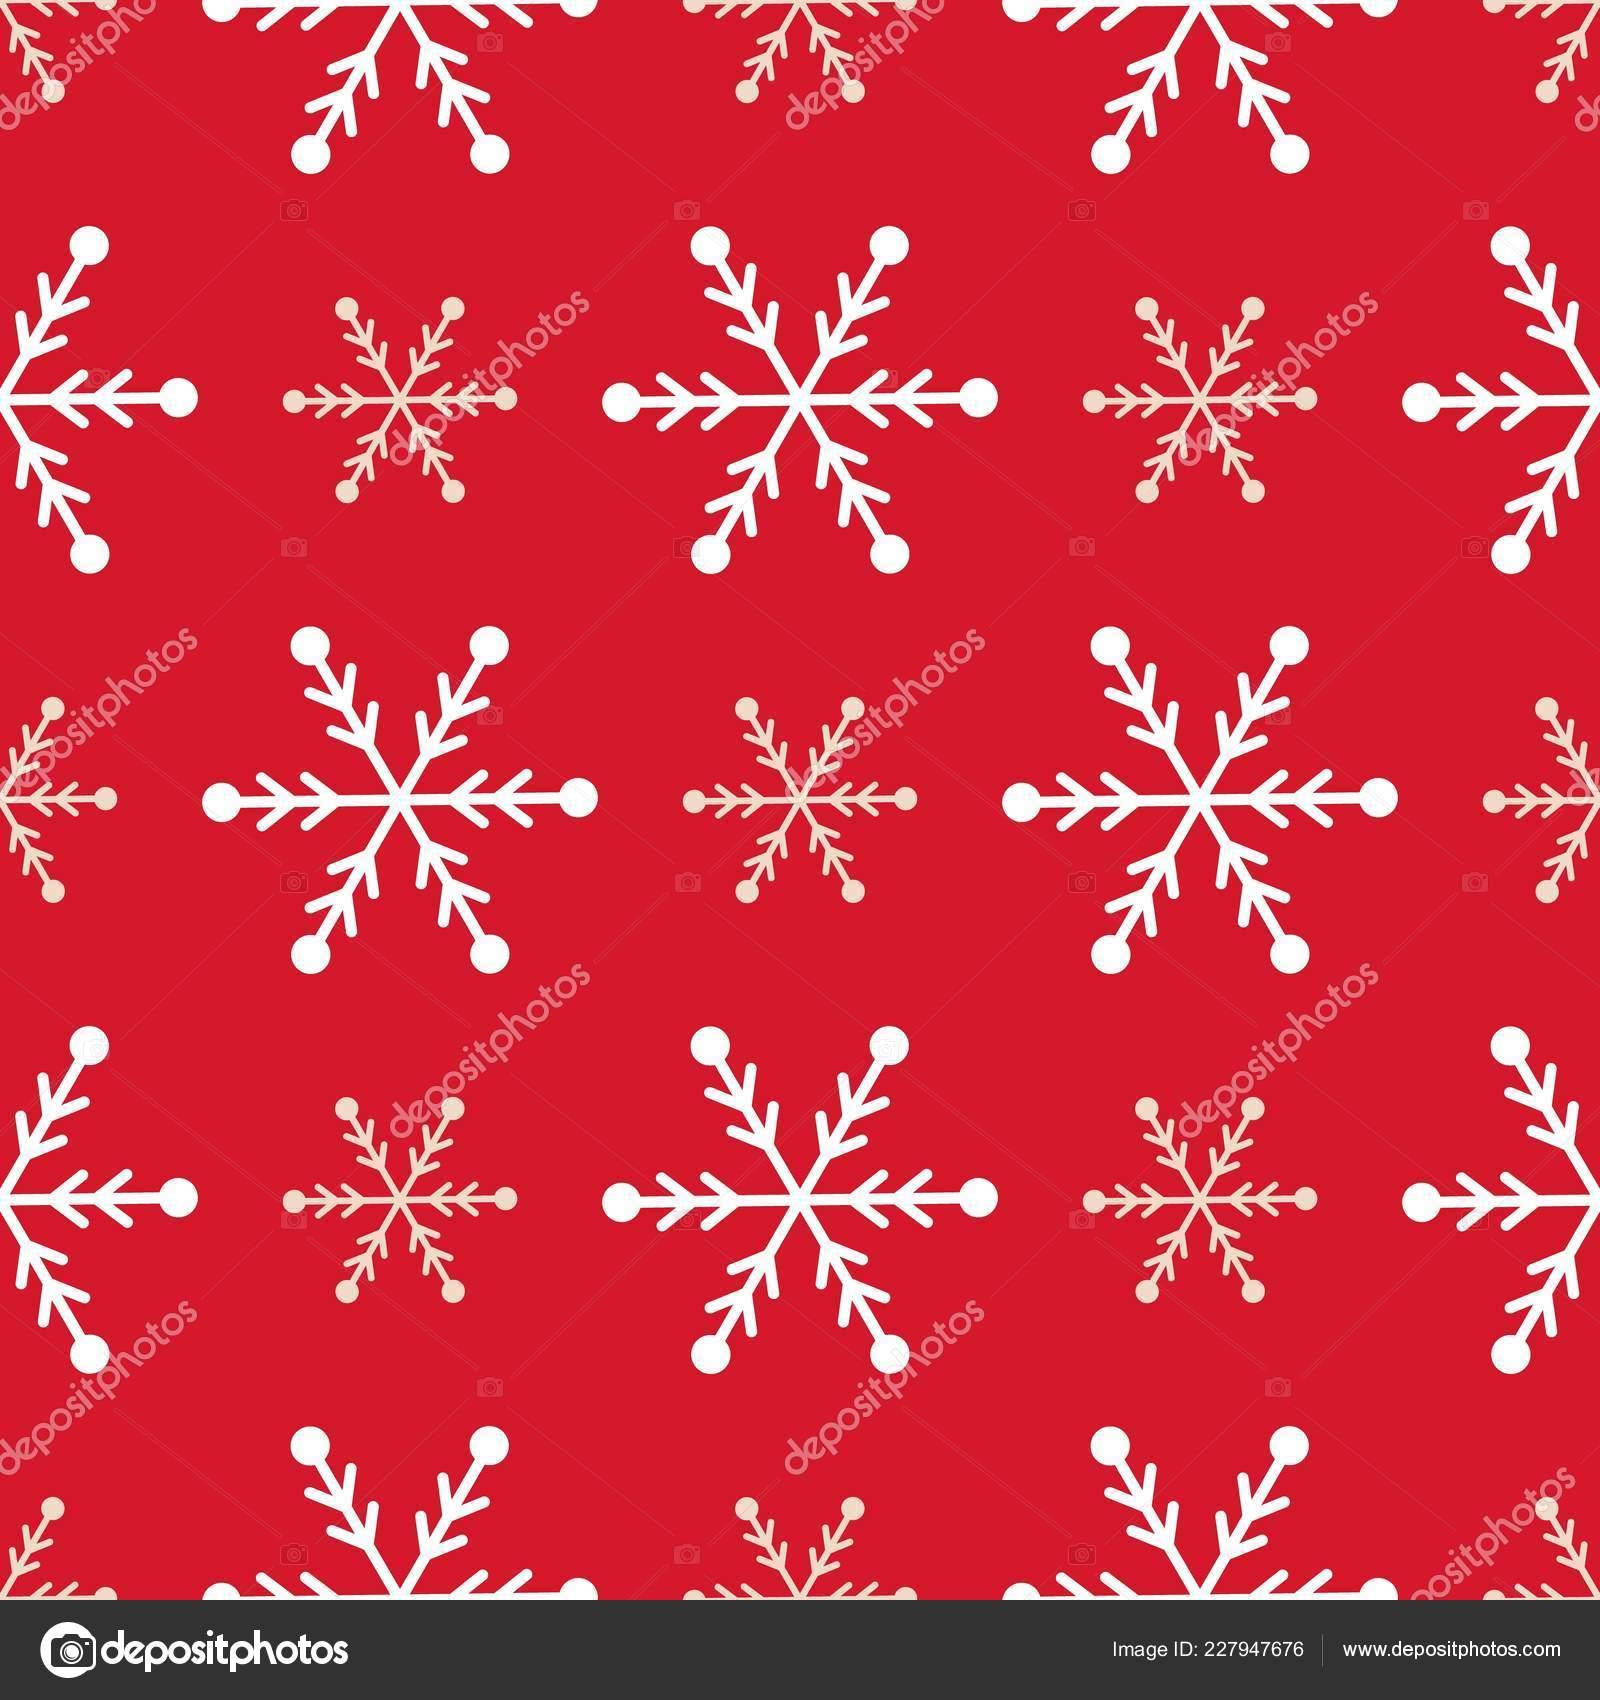 Christmas Snowflake Seamless Pattern Winter Holiday Gift Wrap Snow Background Stock Vector C Danyliuki 227947676